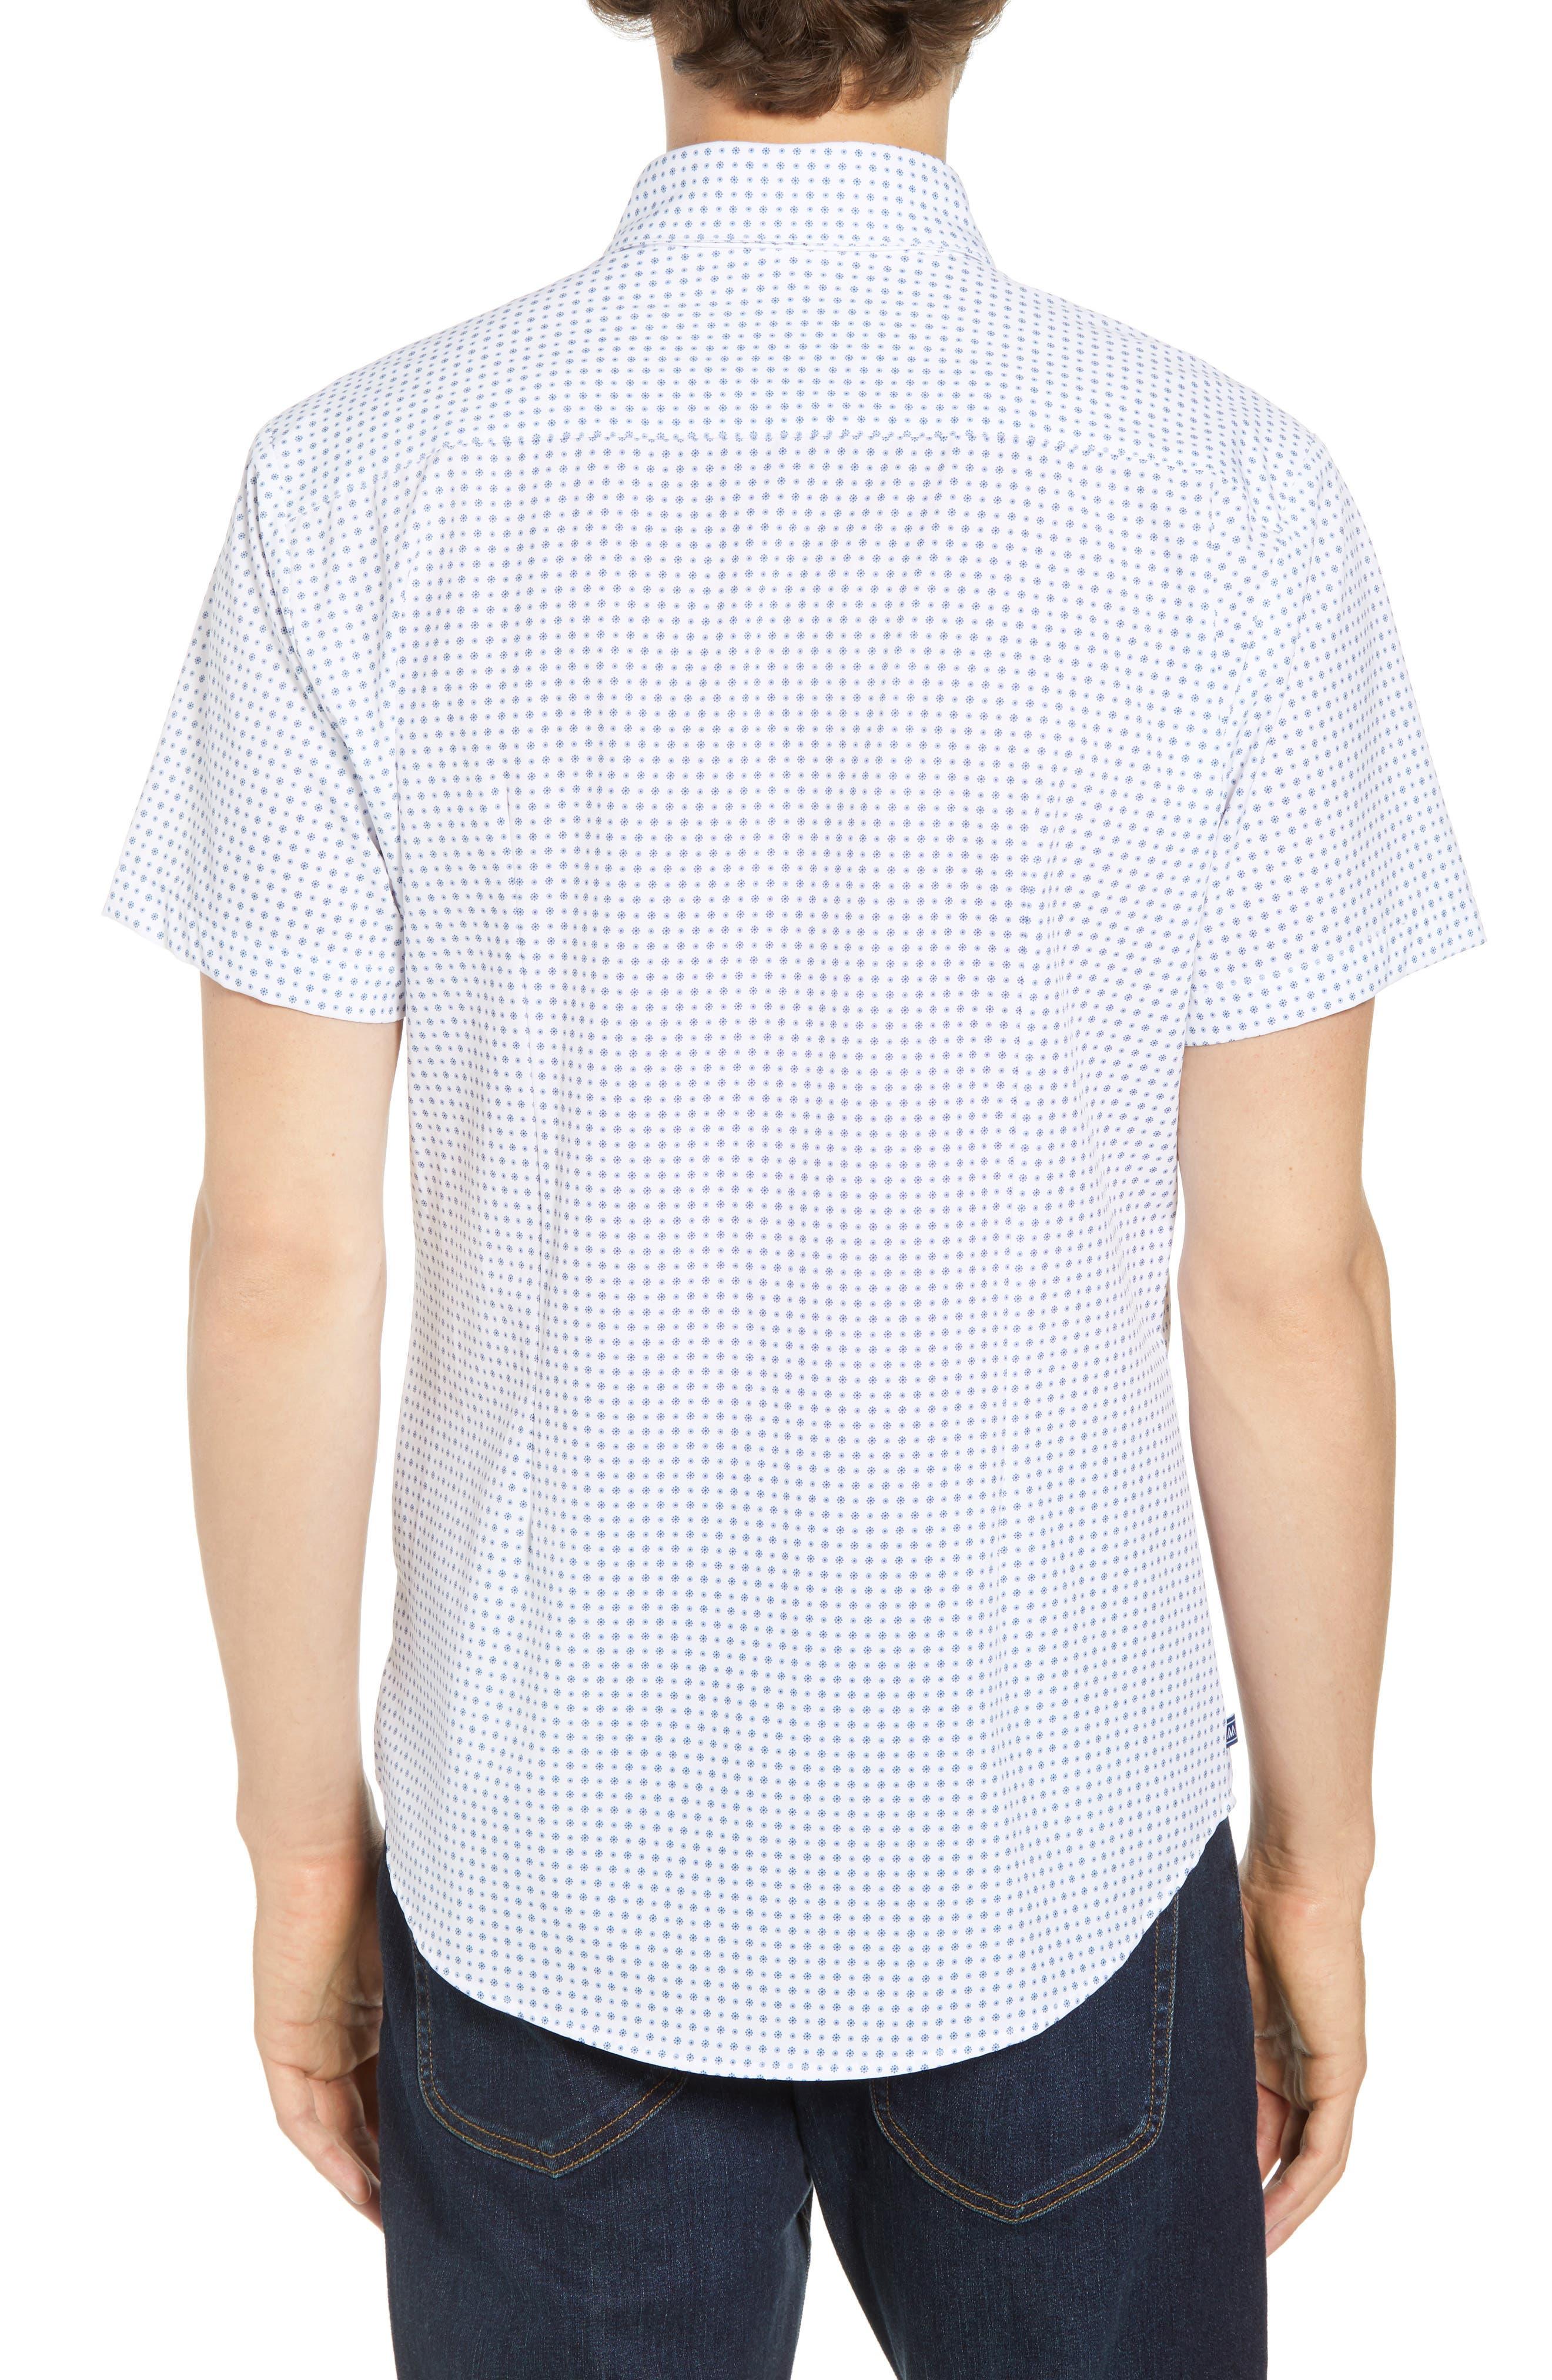 Darst Slim Fit Performance Sport Shirt,                             Alternate thumbnail 2, color,                             117